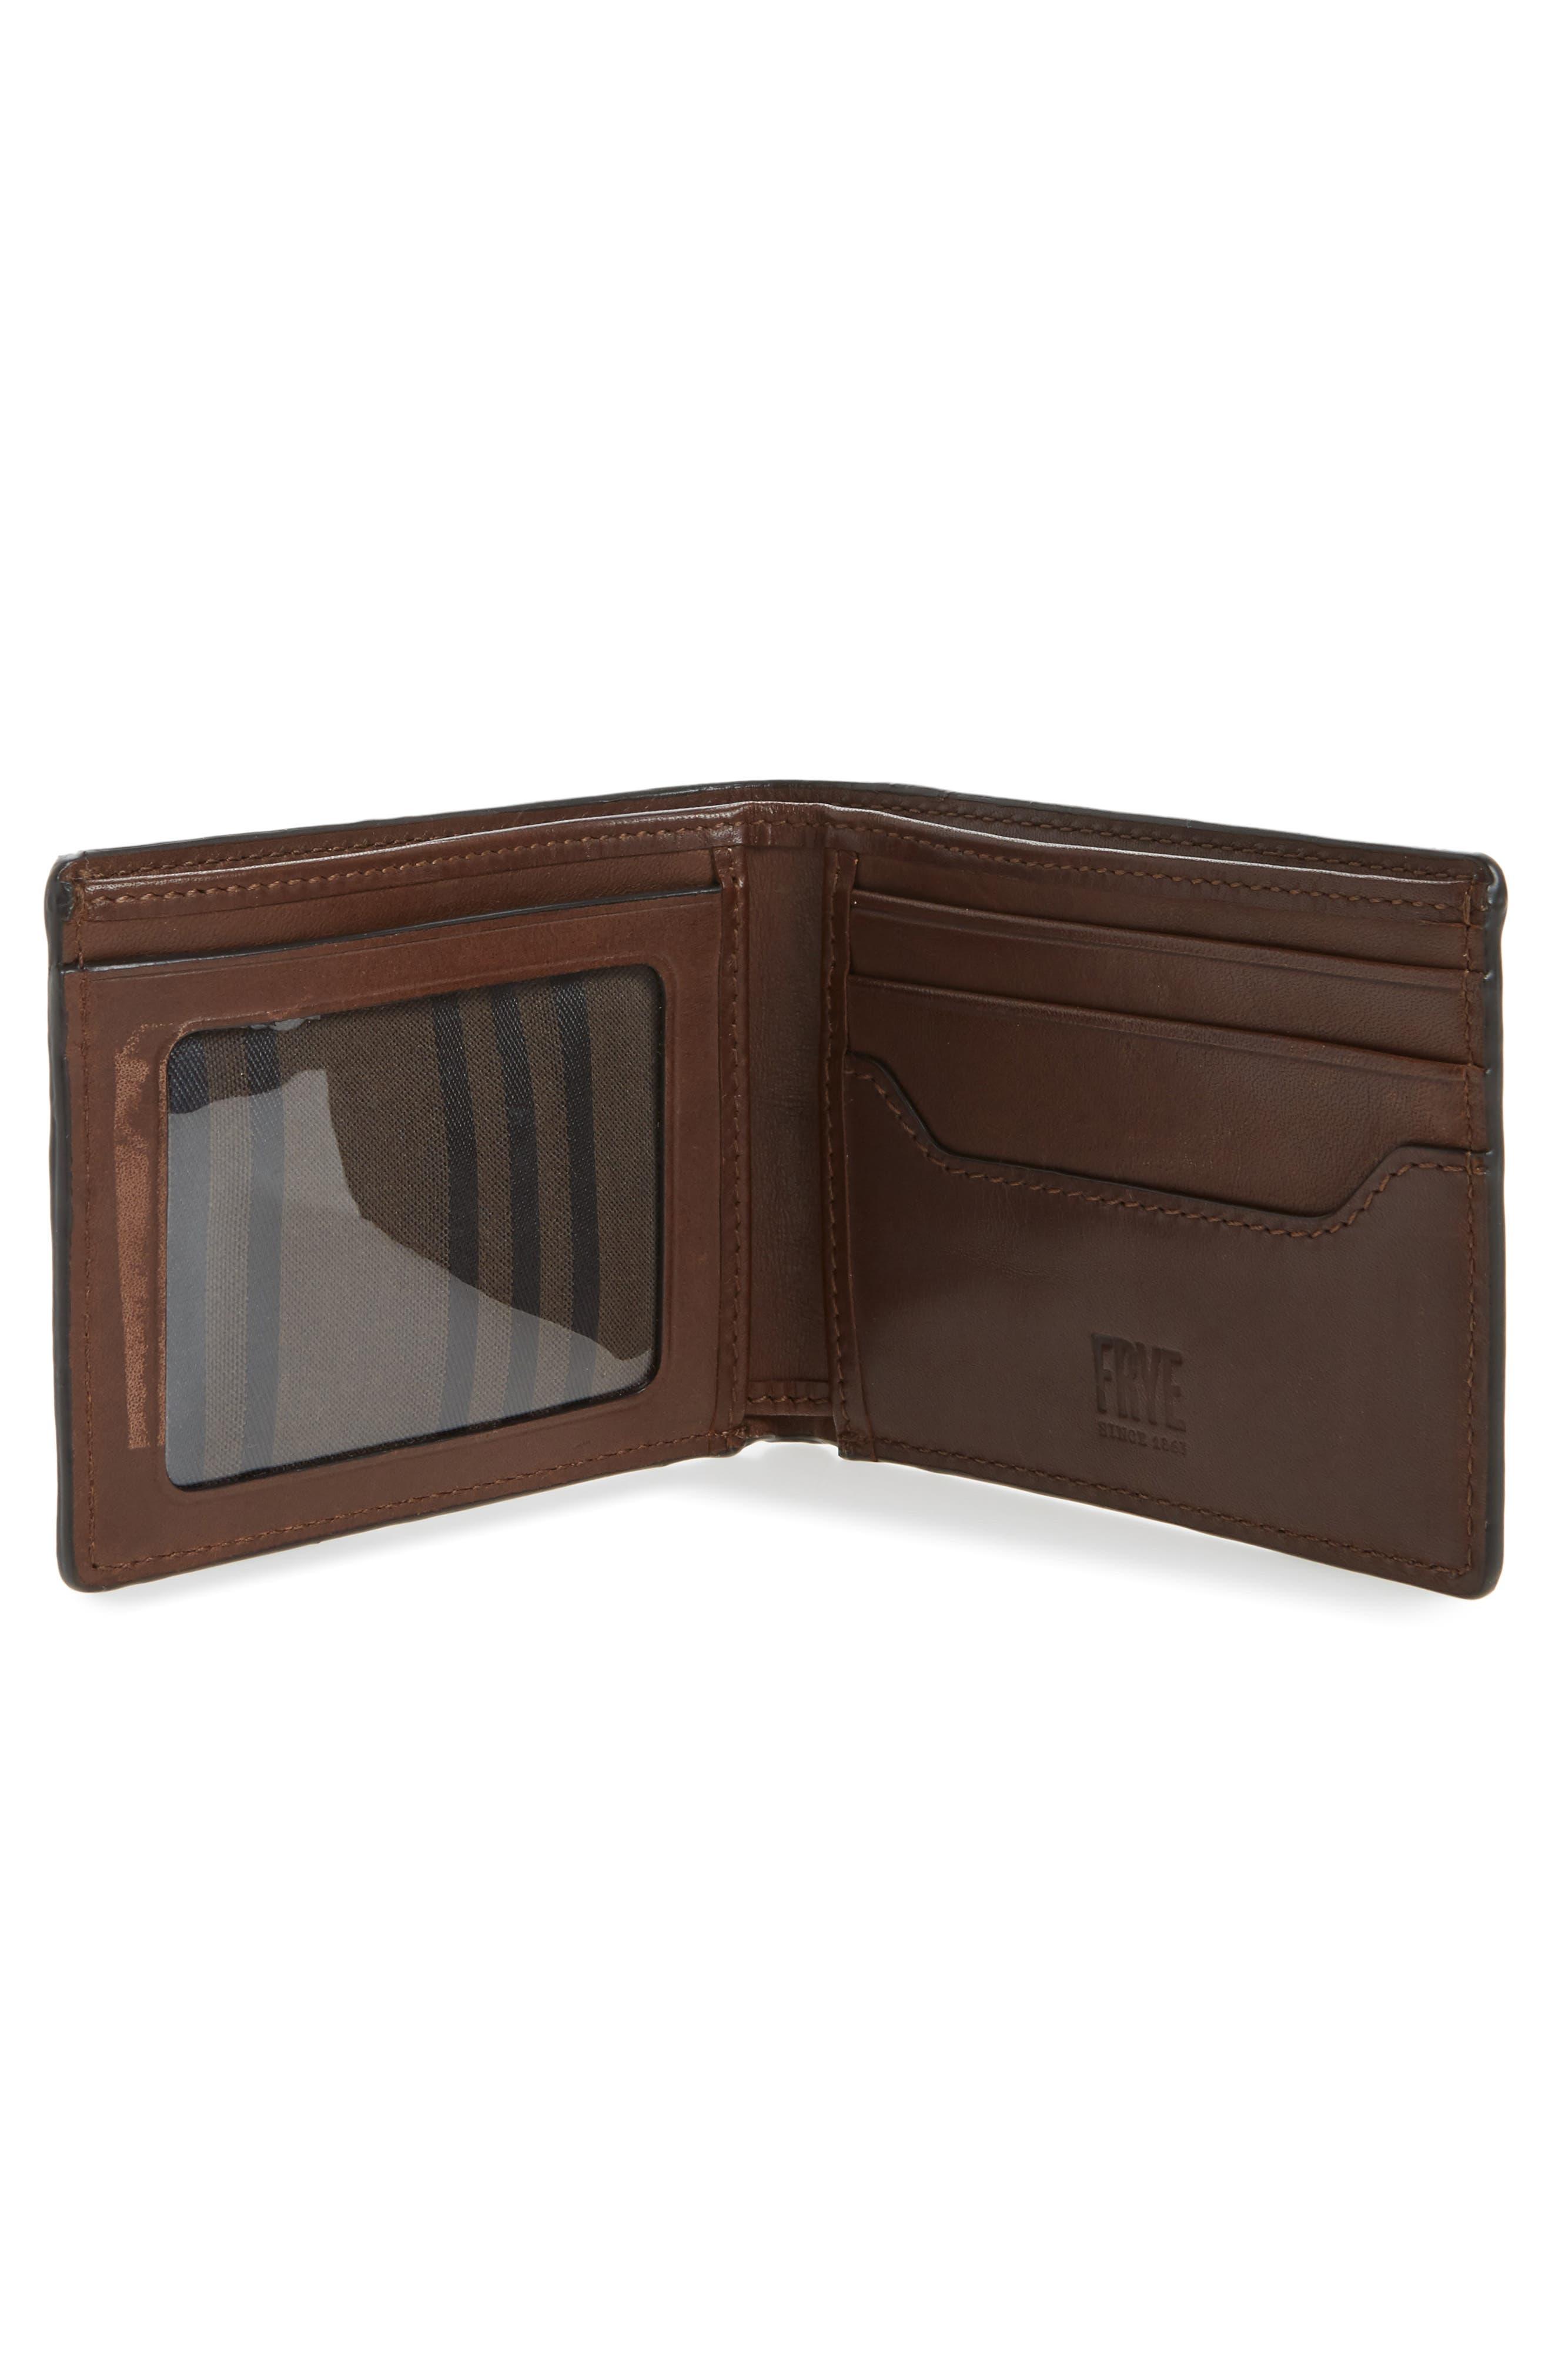 Logan Leather Wallet,                             Alternate thumbnail 2, color,                             DARK BROWN